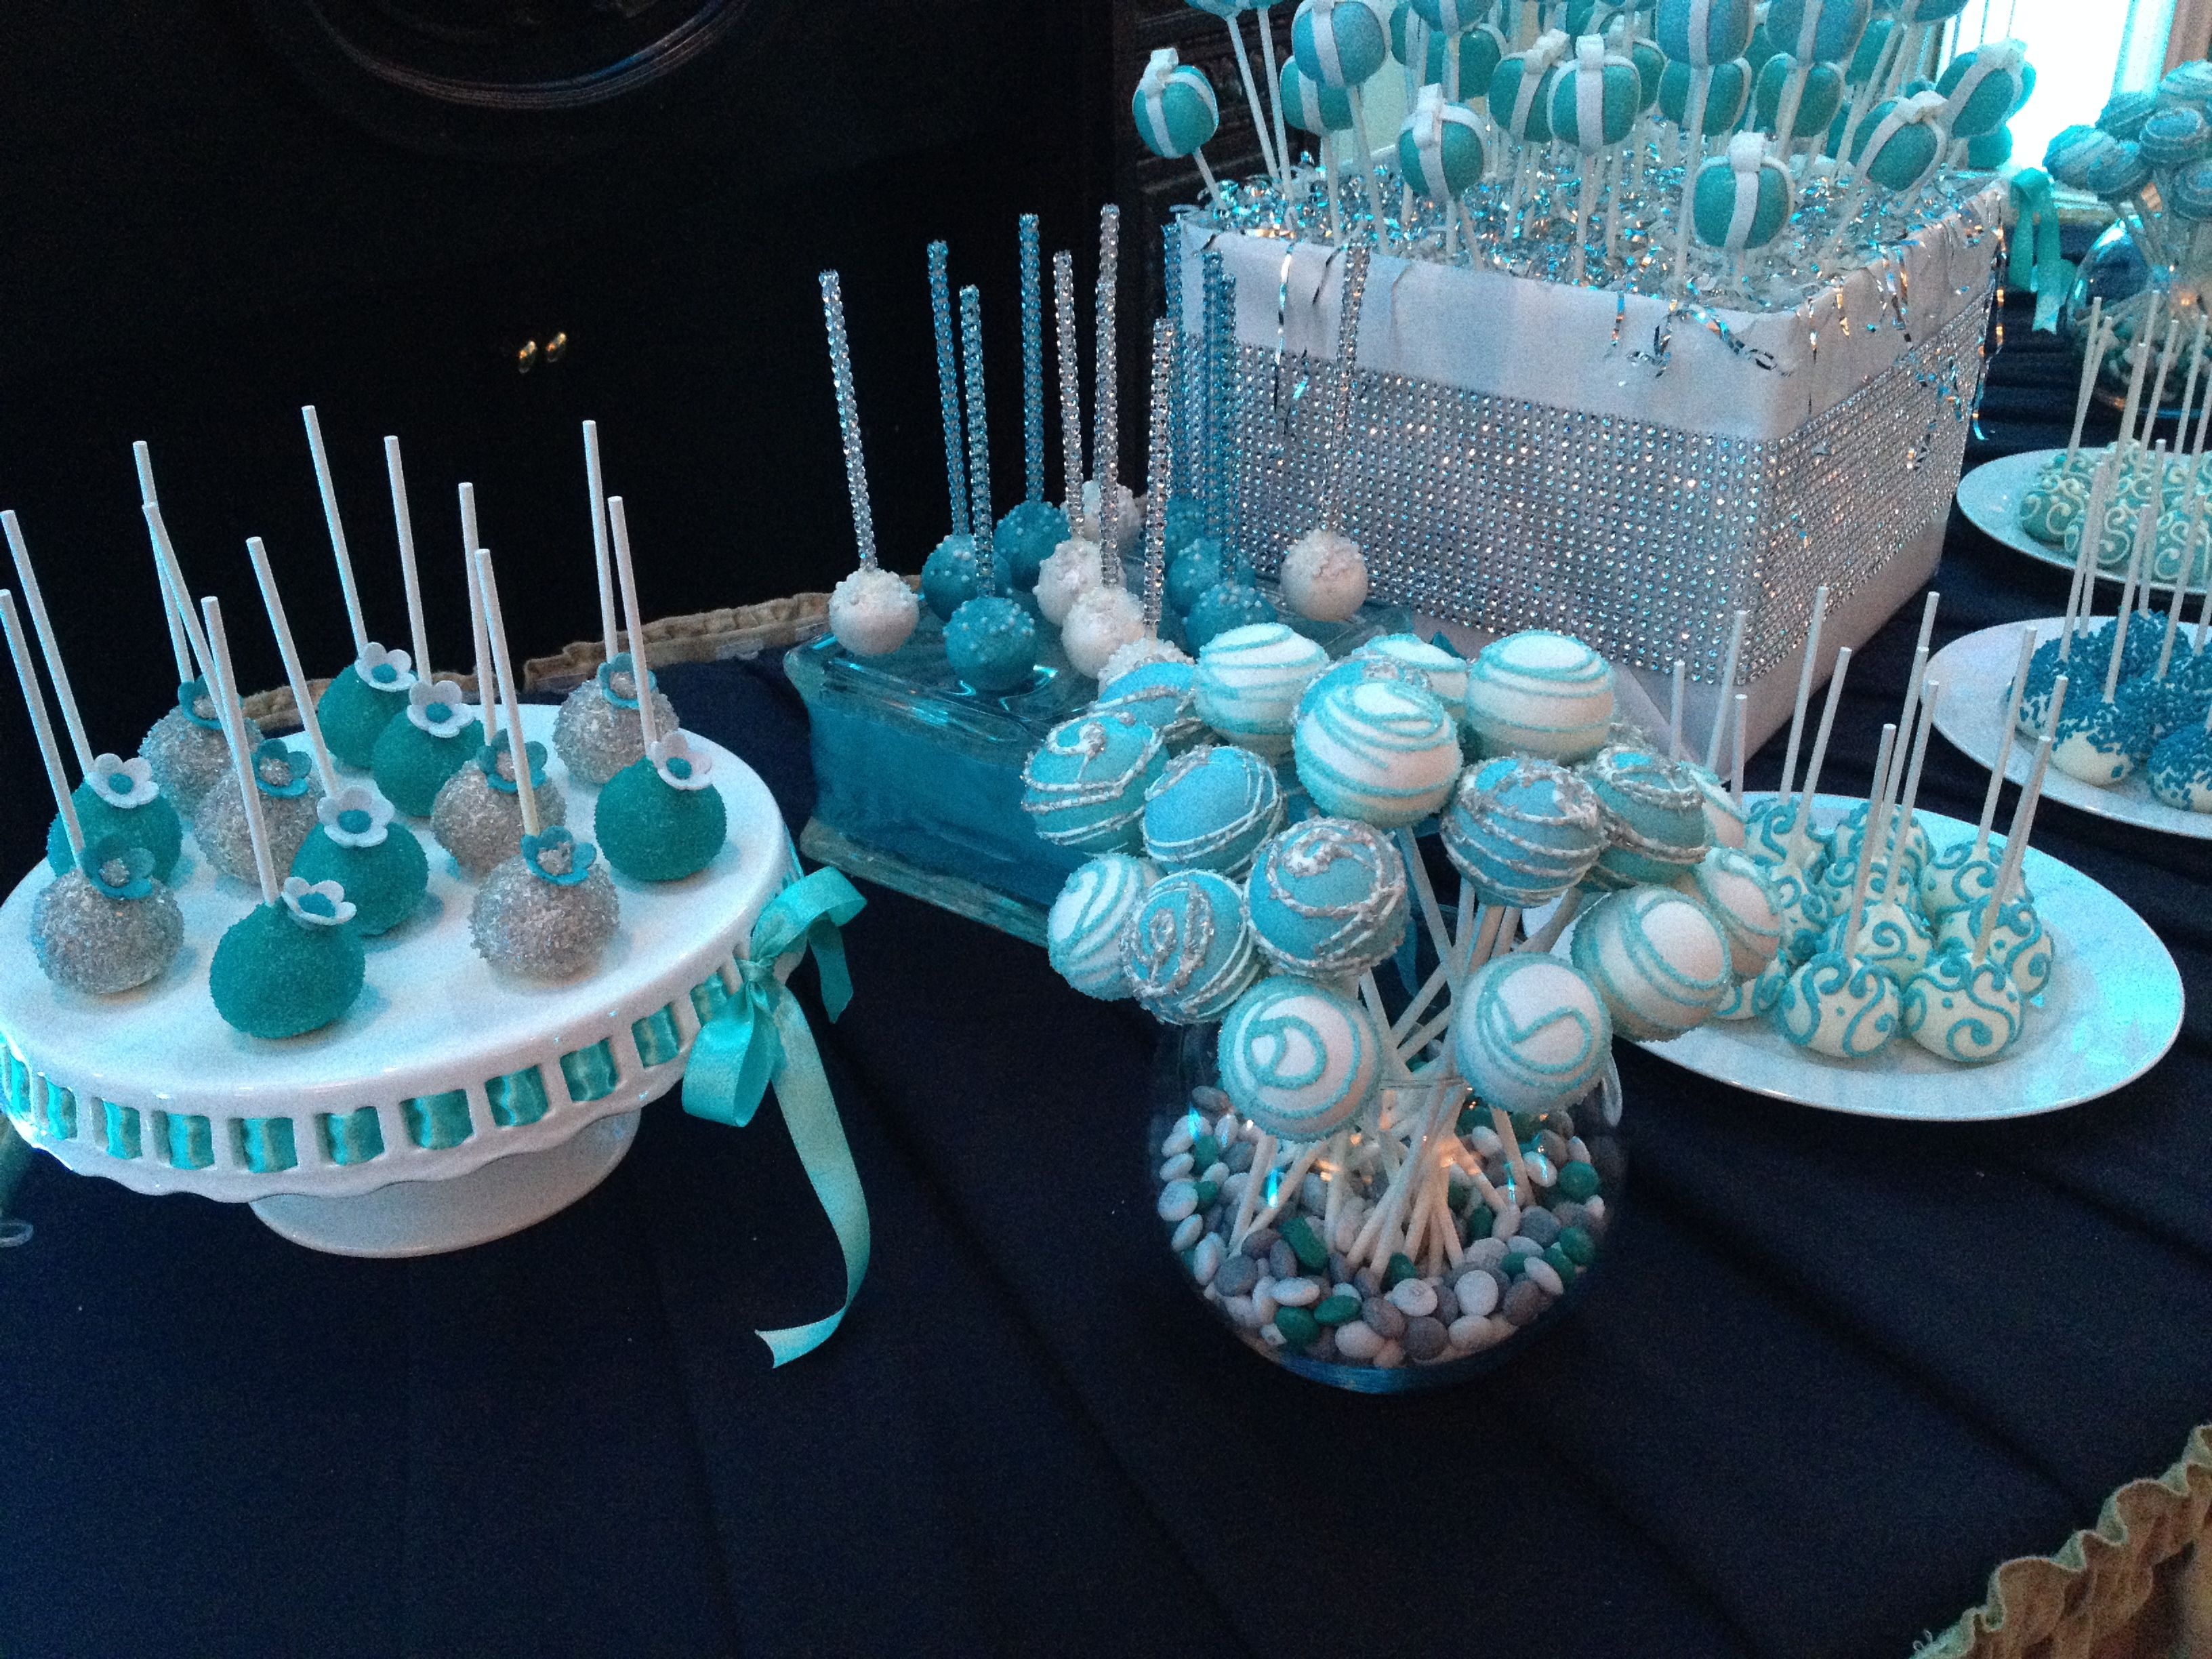 Cake Pop Dessert Table Teal Aqua Blue Silver Tiffany Box Bling Blue Cake Pops Cake Pops Wedding Cake Table